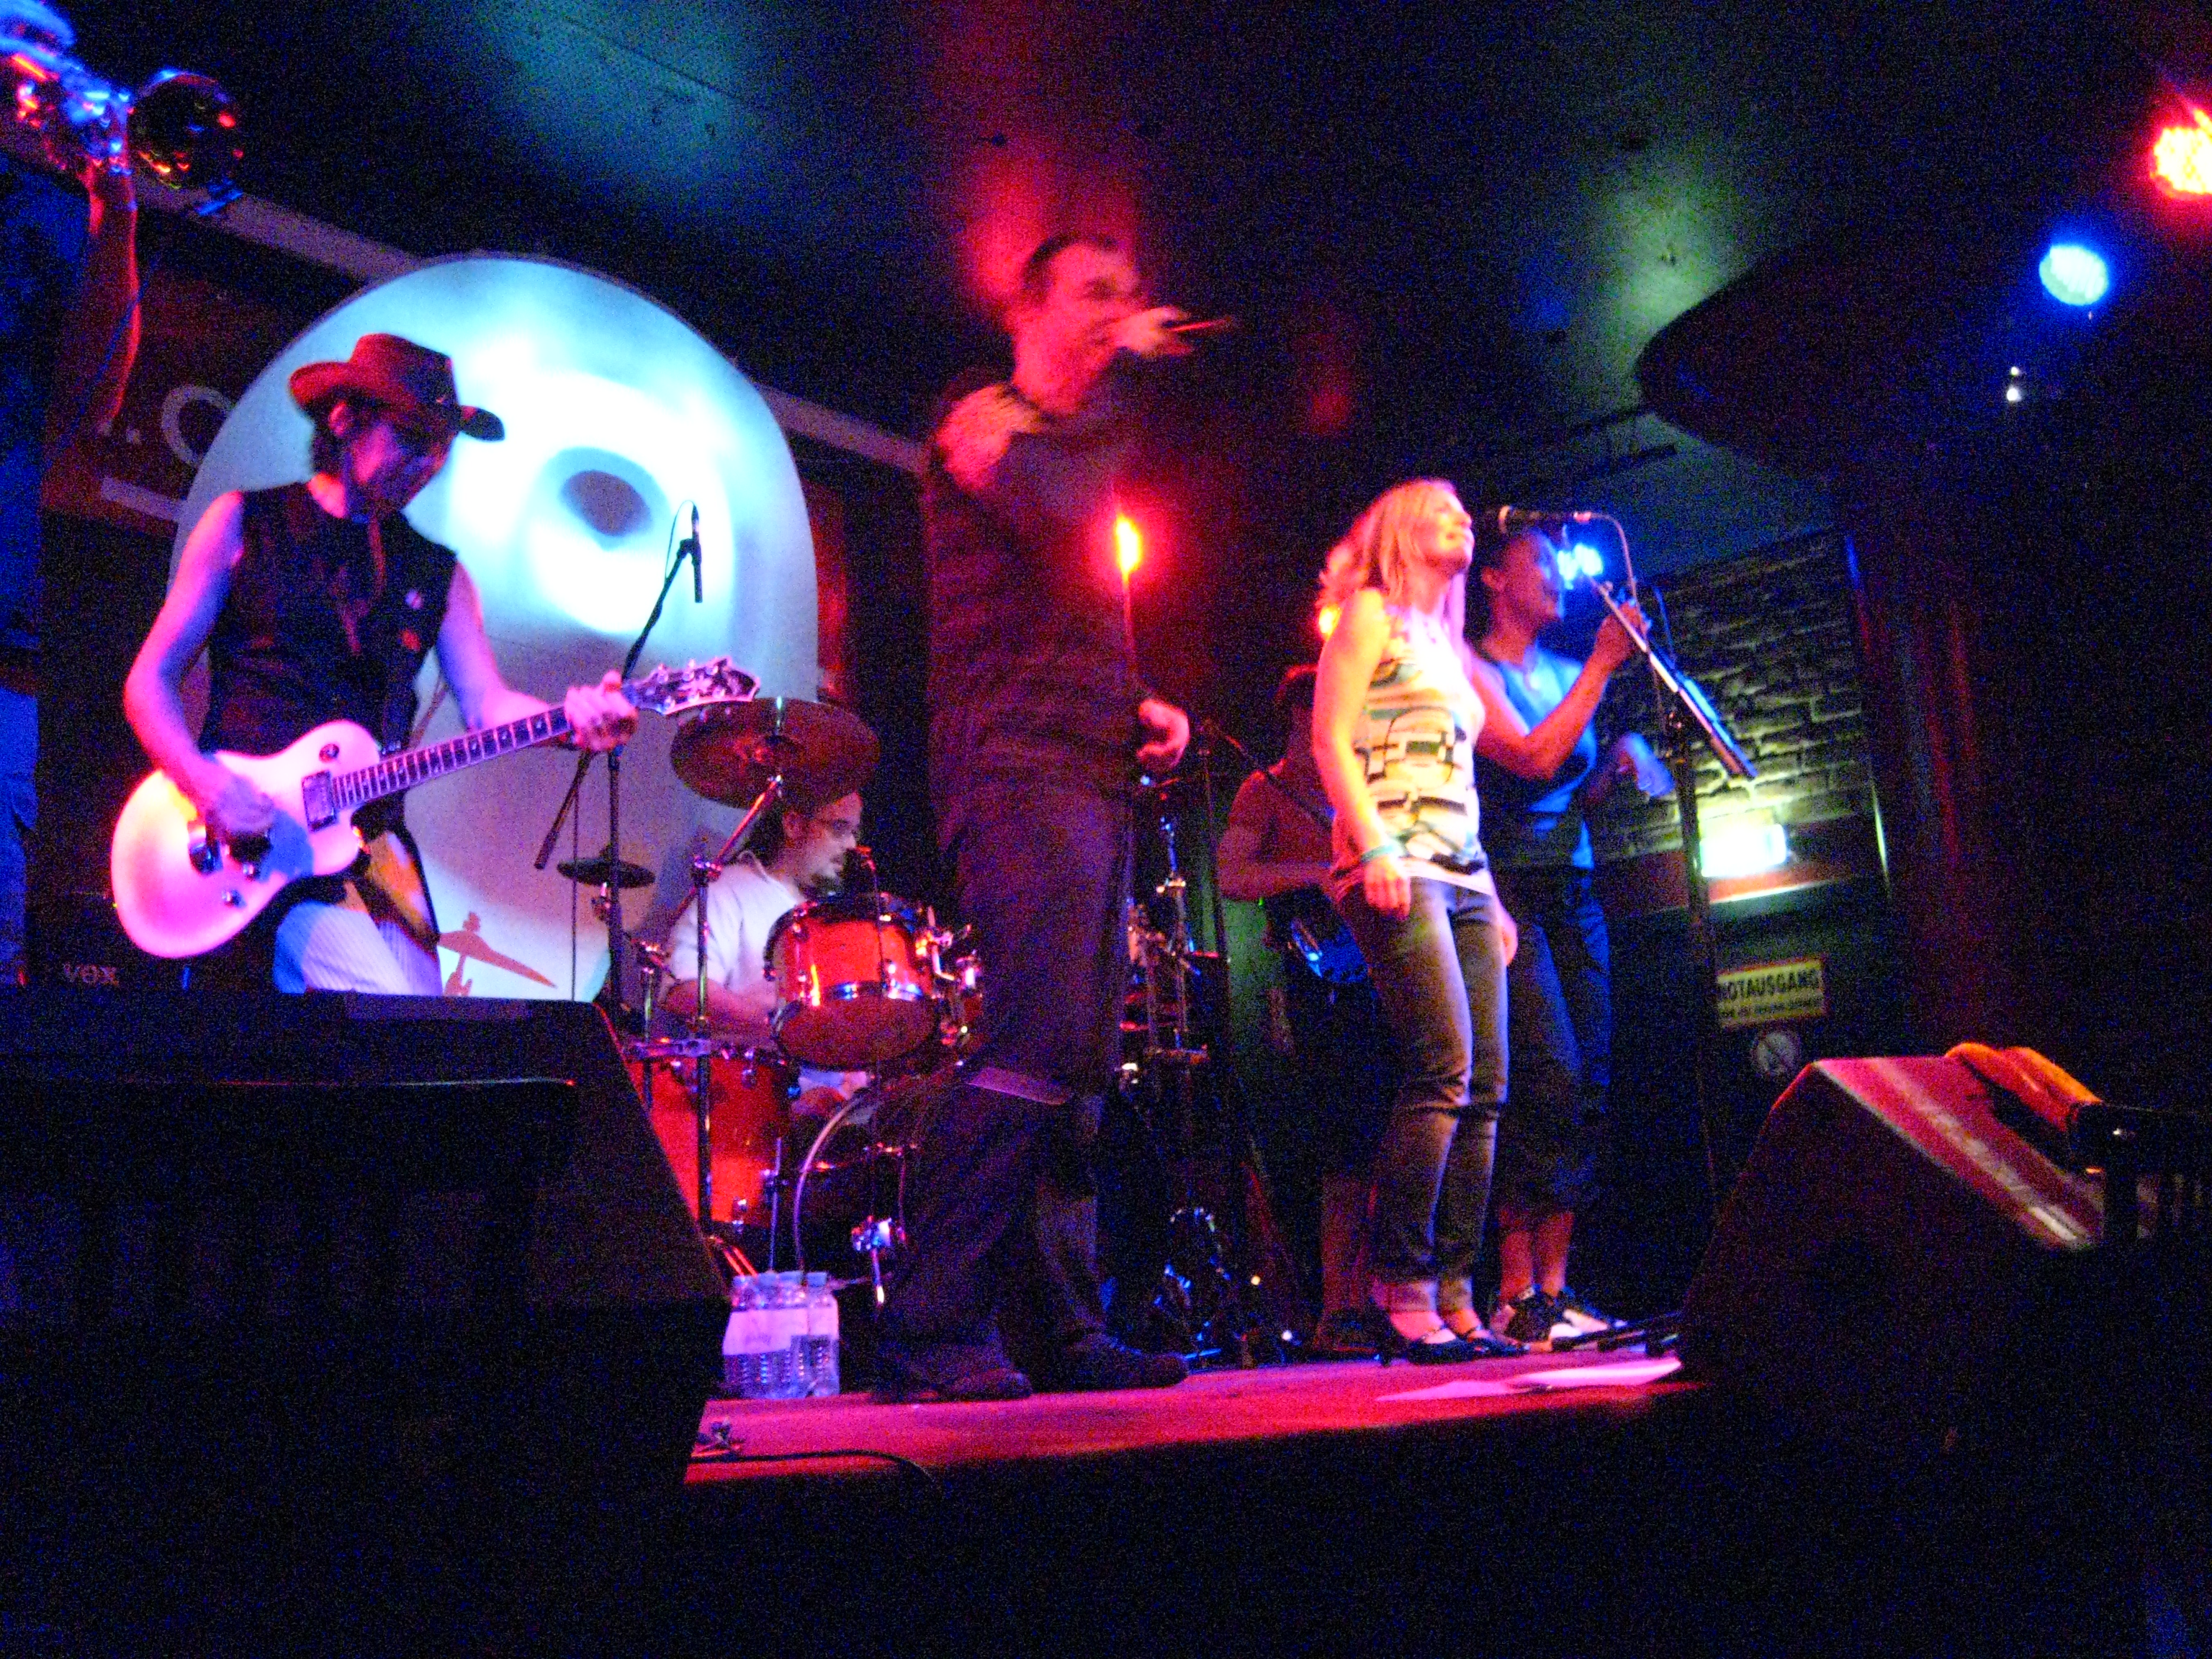 Band Salzmann